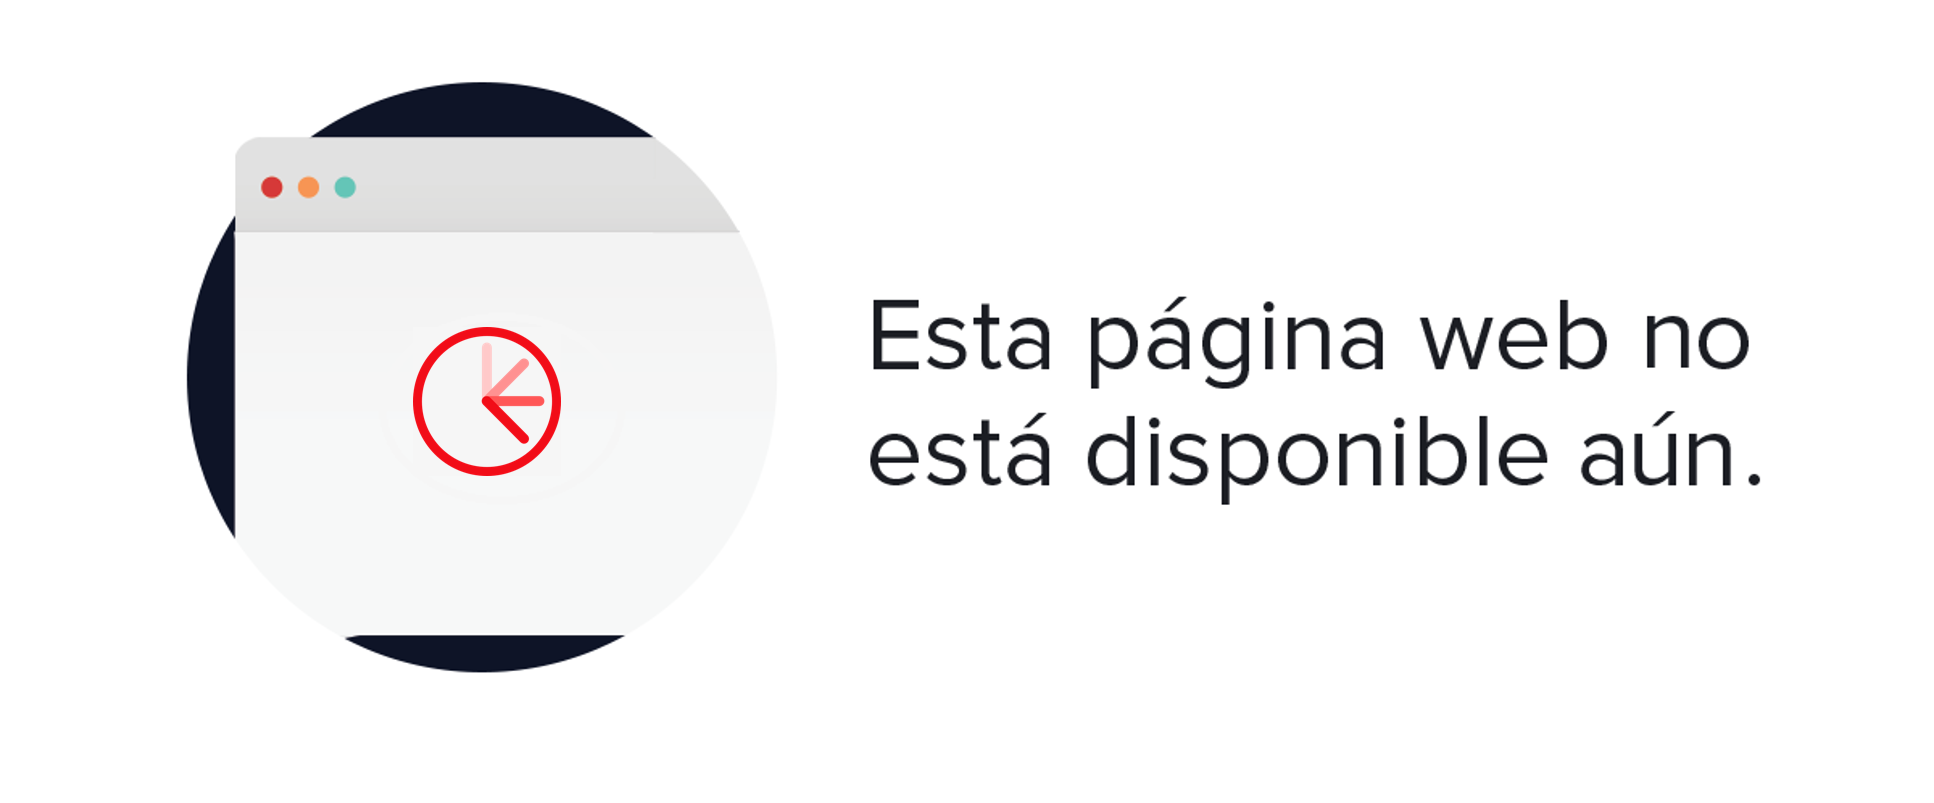 Boutique Moschino - Chaqueta negra de mujer Boutique Moschino con cierre de botones Negro 001089566200914038 - CFYLQON